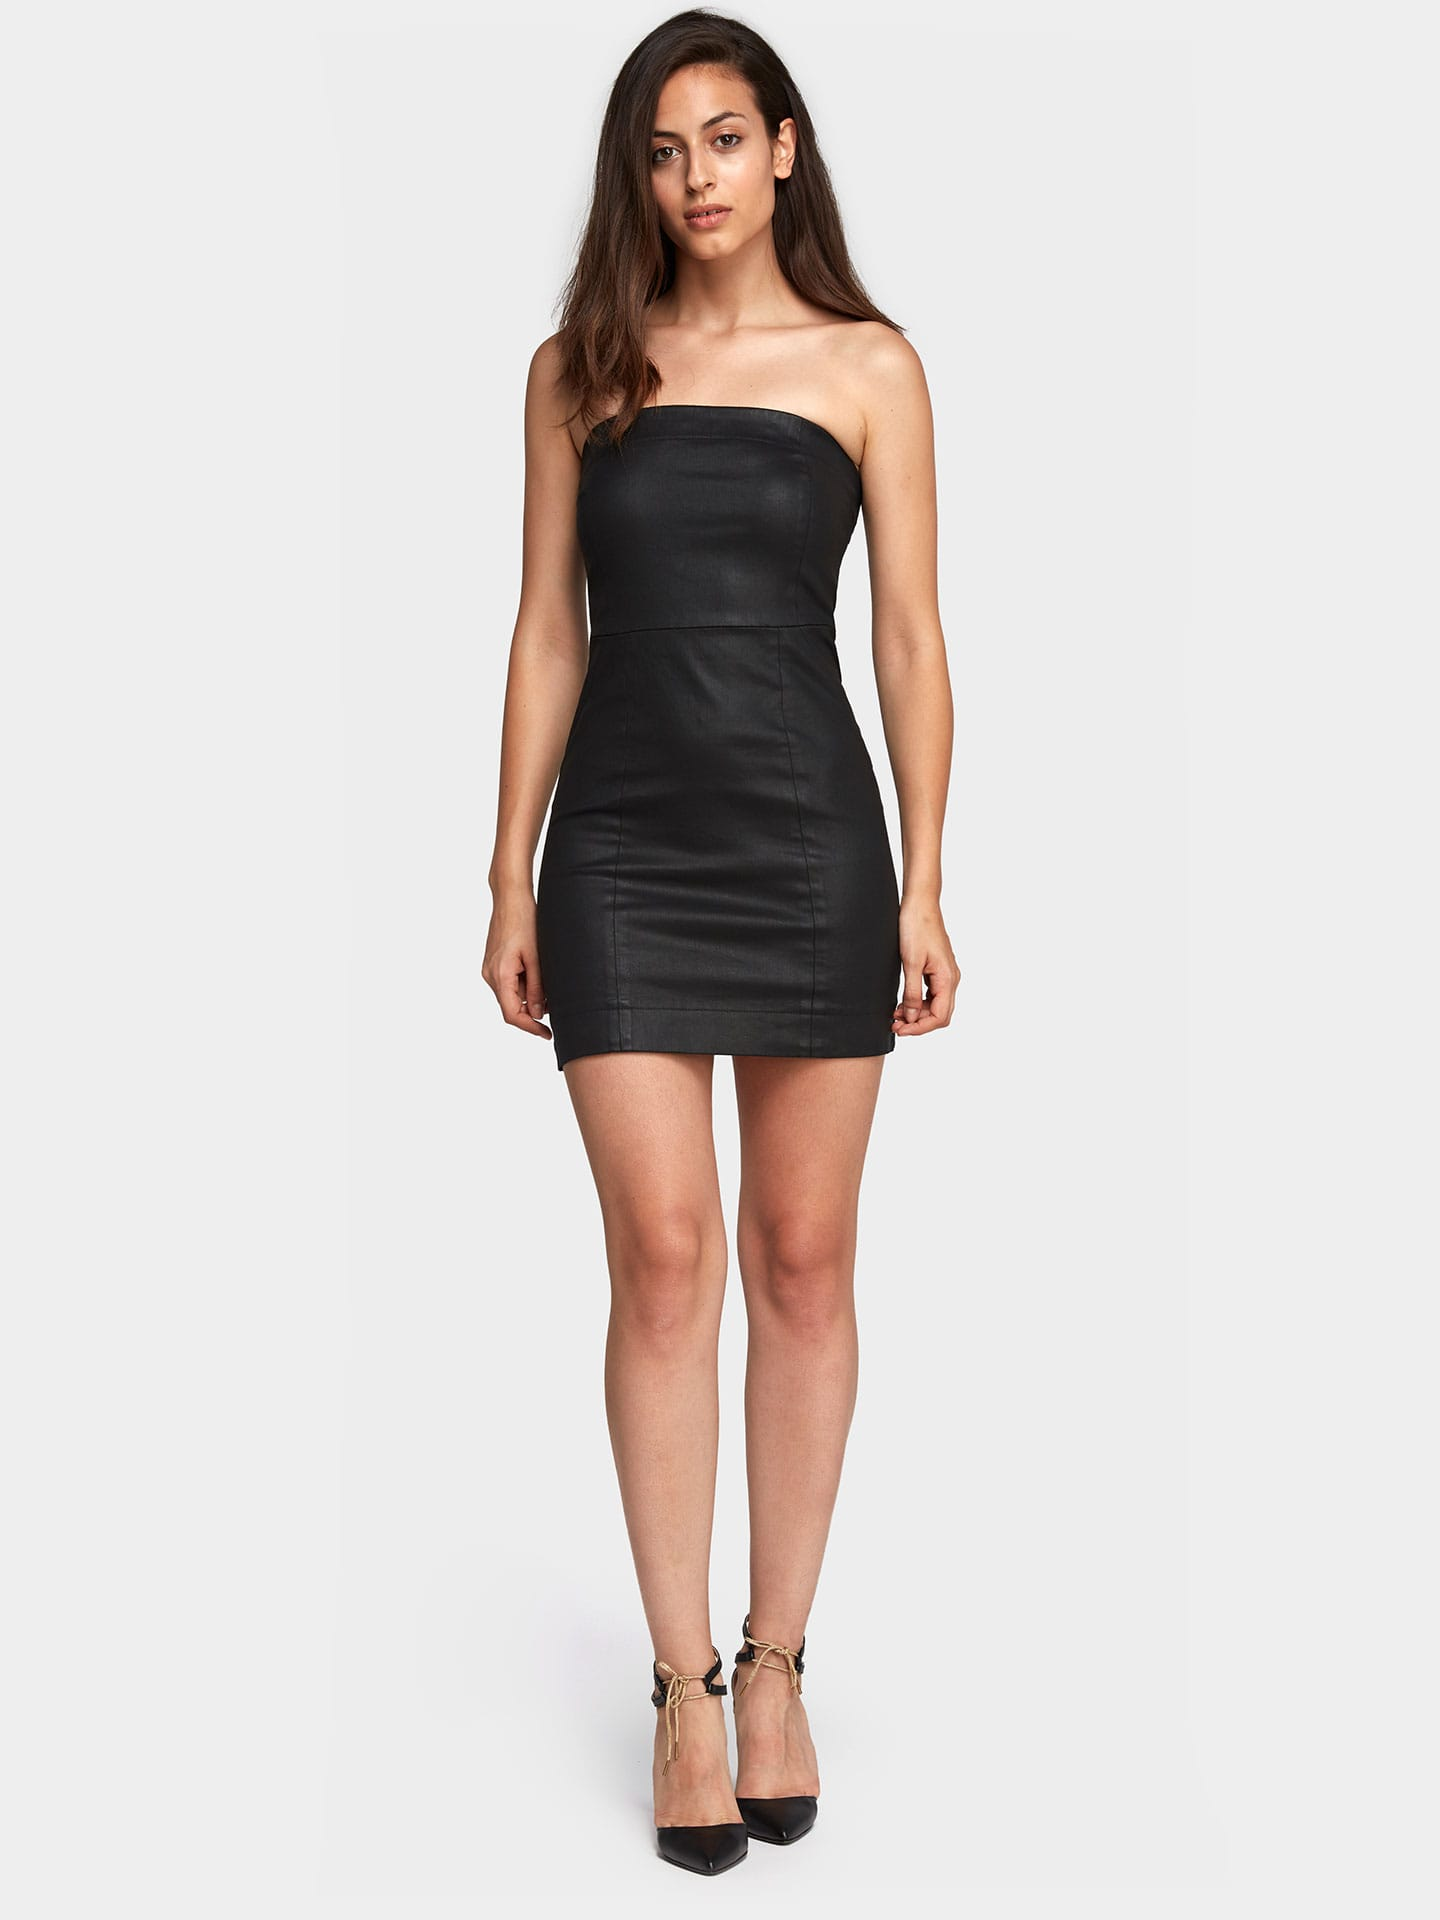 finest selection 39fb7 8ed0f Modular Dress